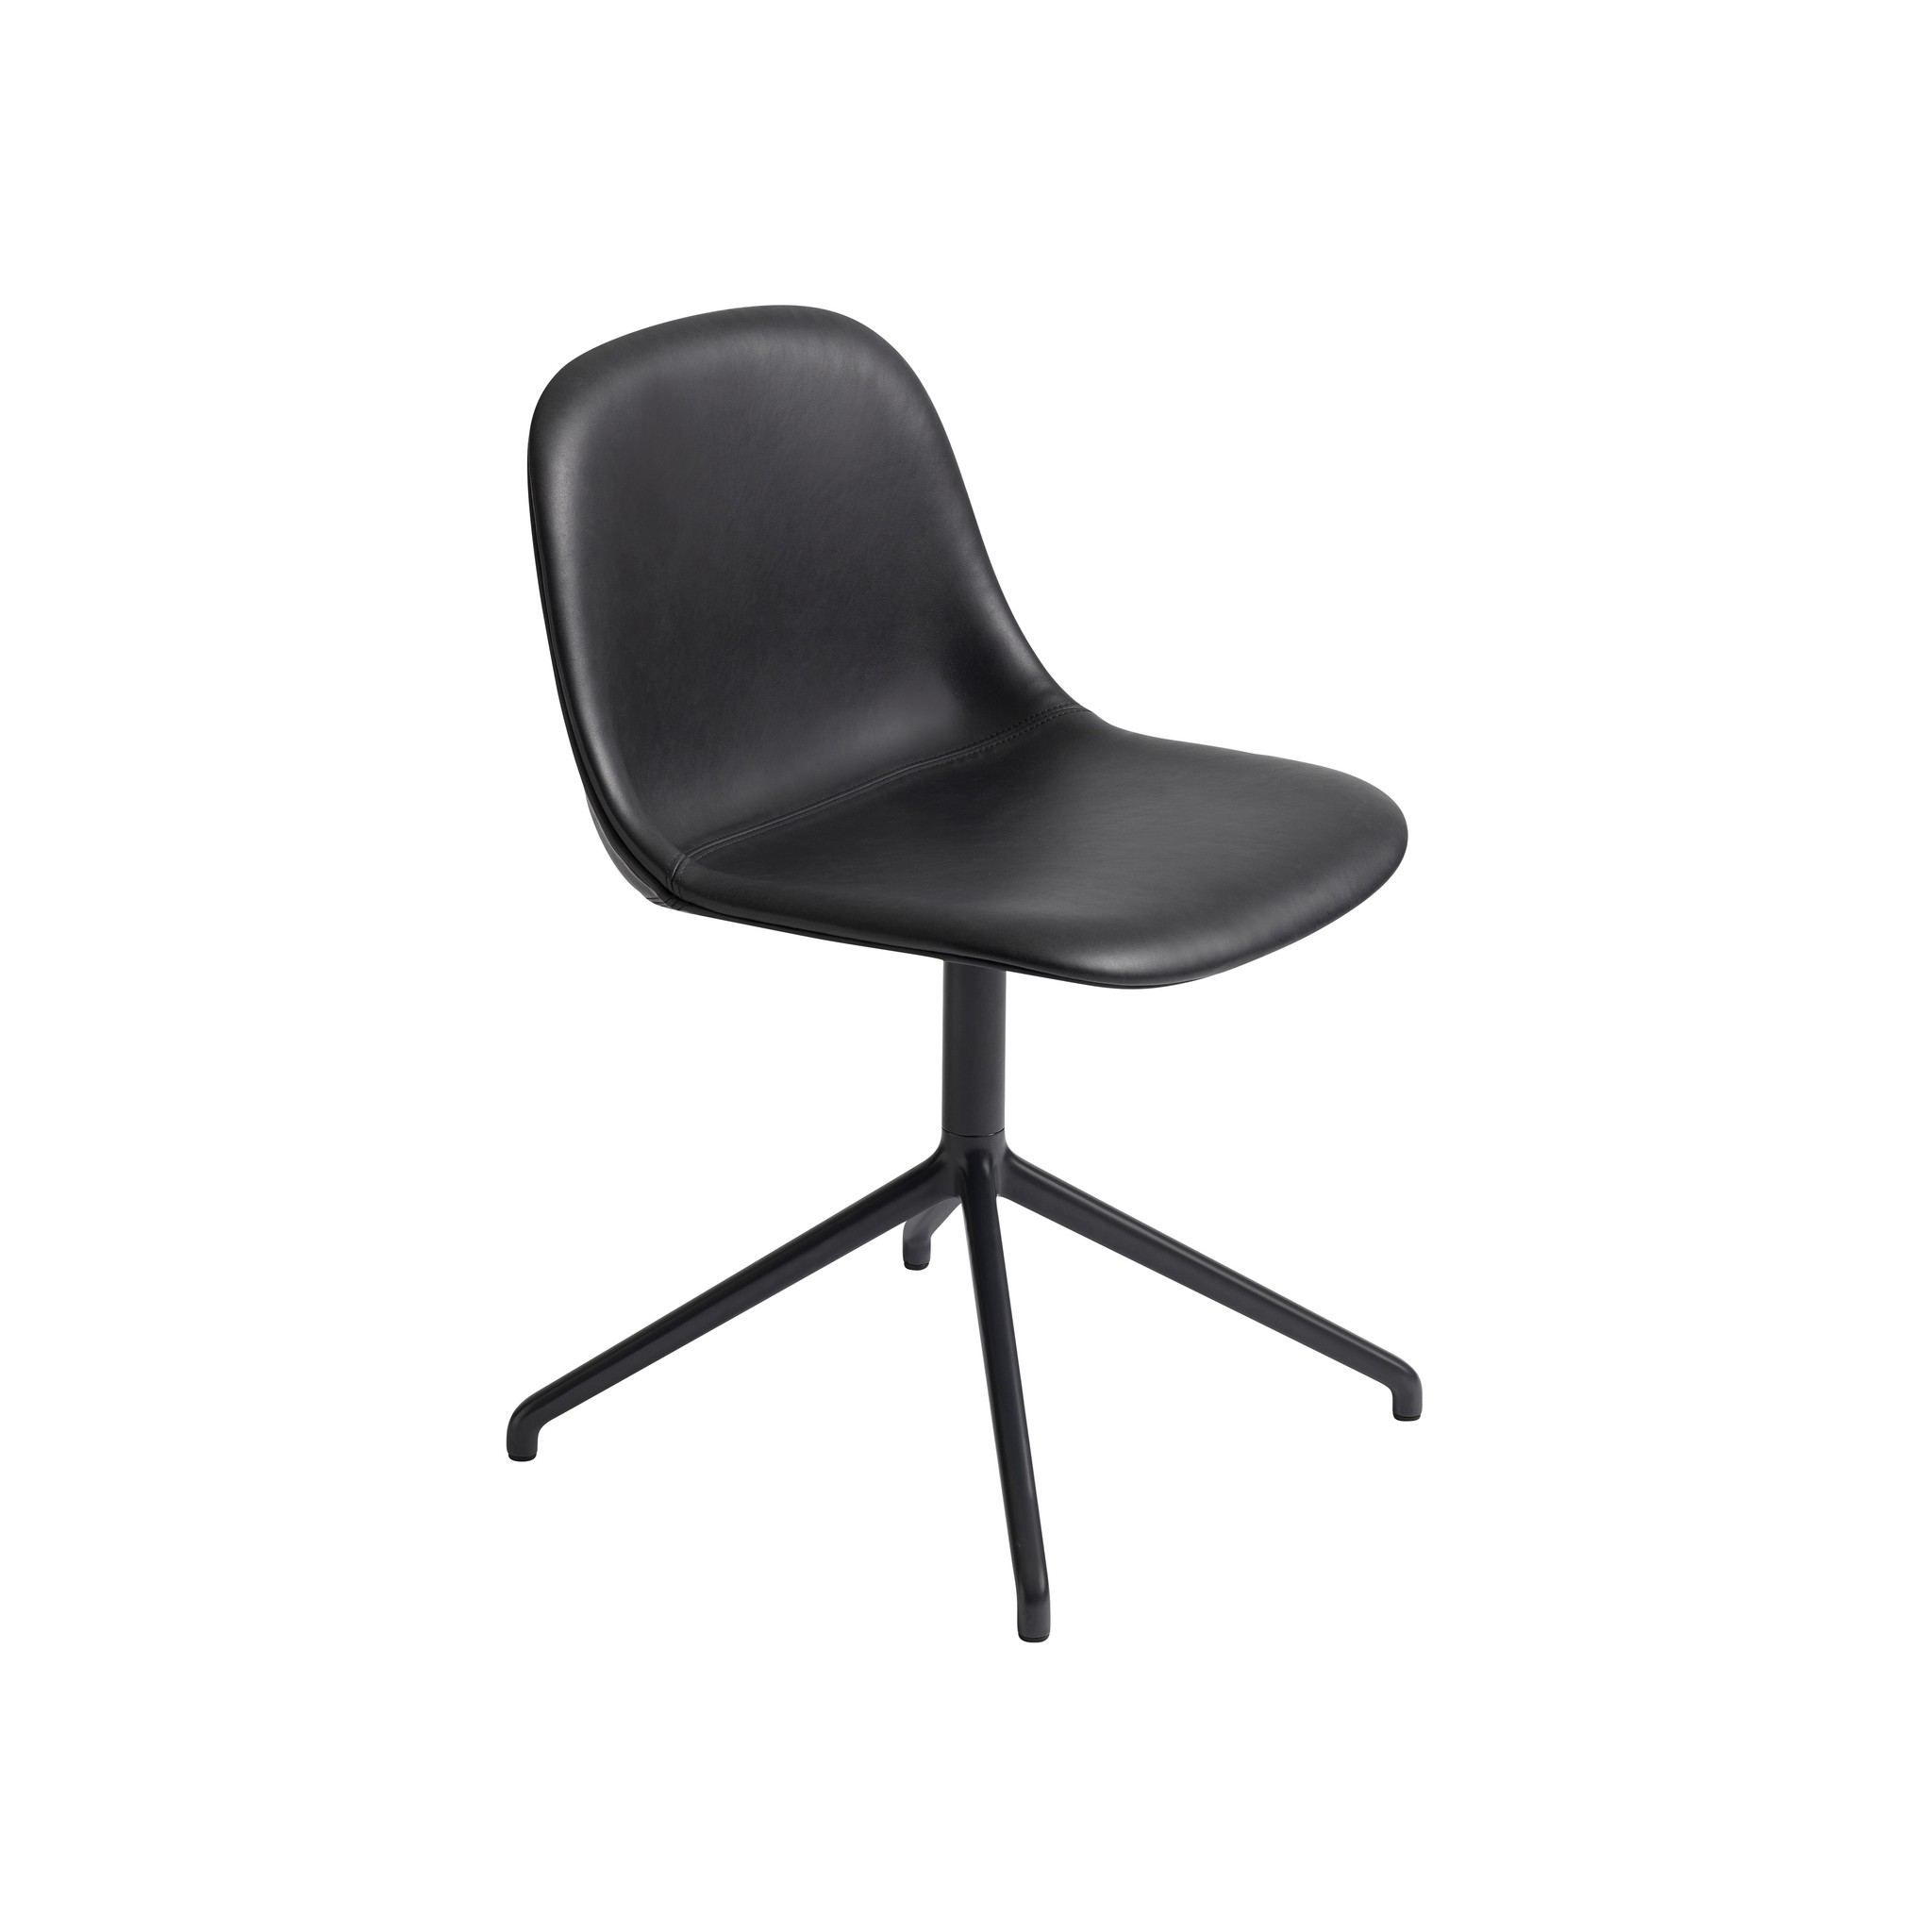 Fiber side chair swivel base w.o. return-10